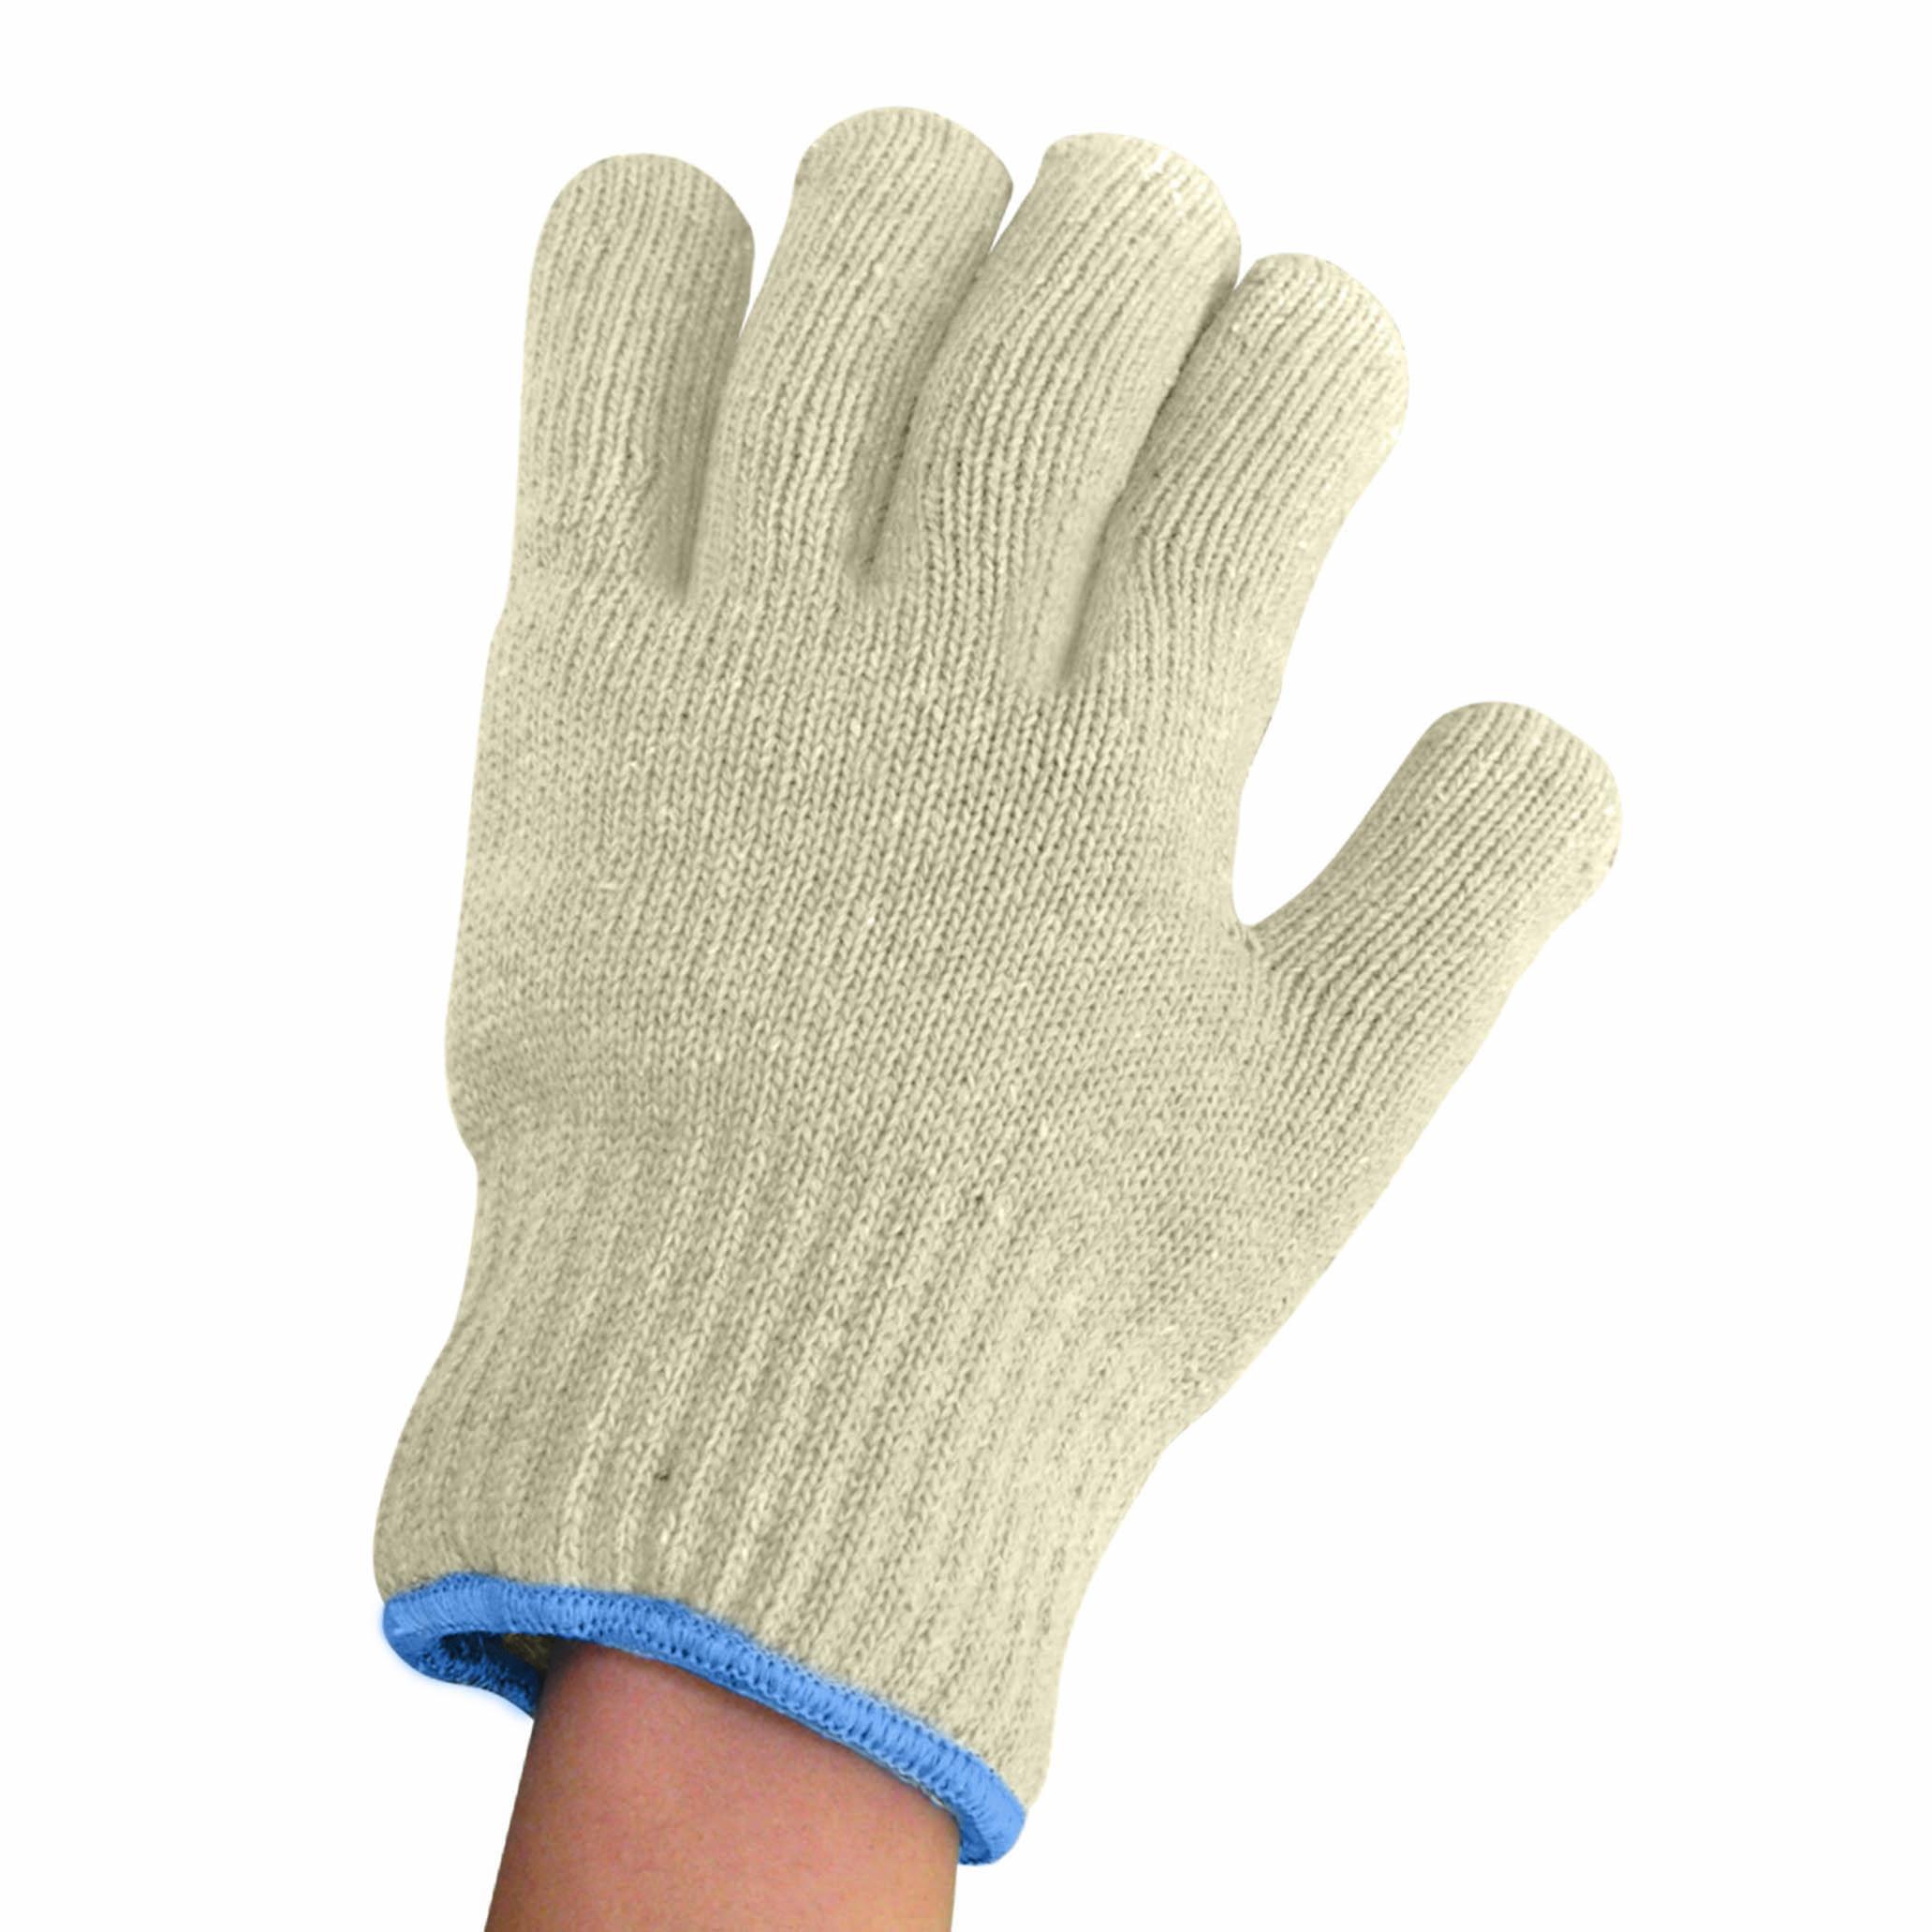 Tuff Glove EXTRA 1